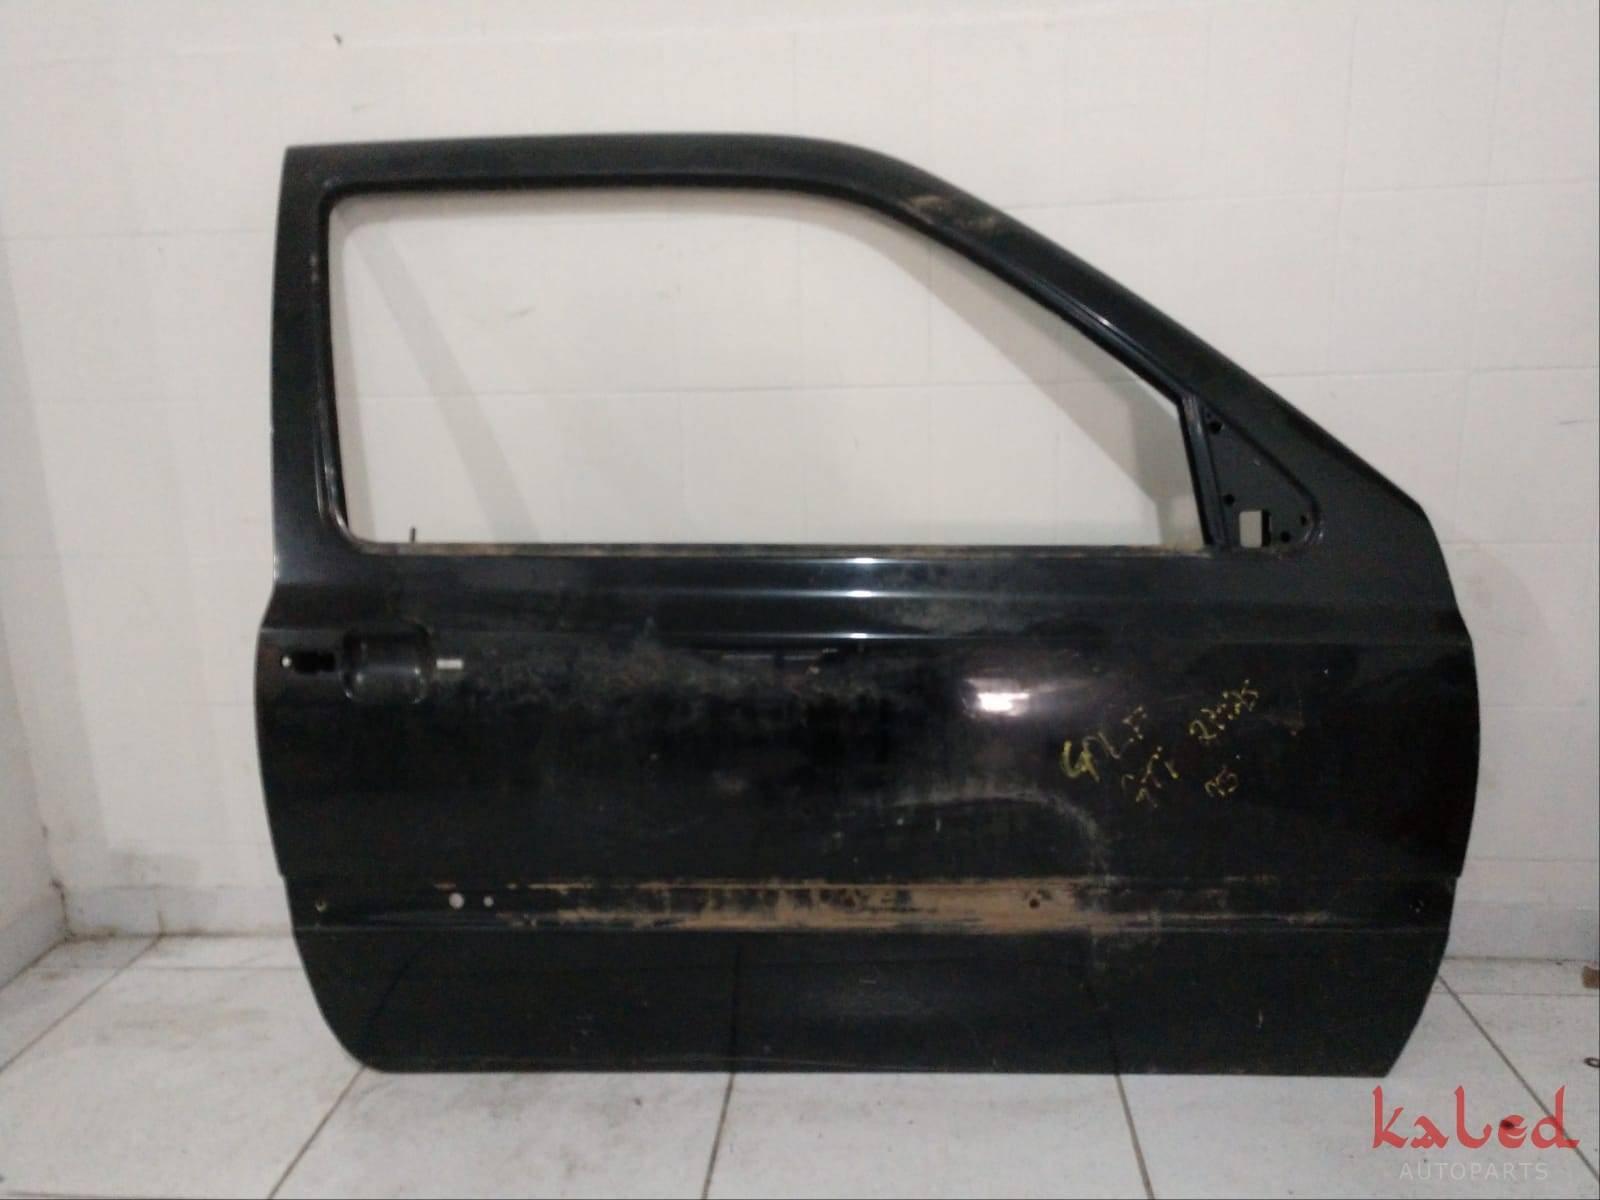 Porta direita Golf 2 portas 93 a 98 - Kaled Auto Parts